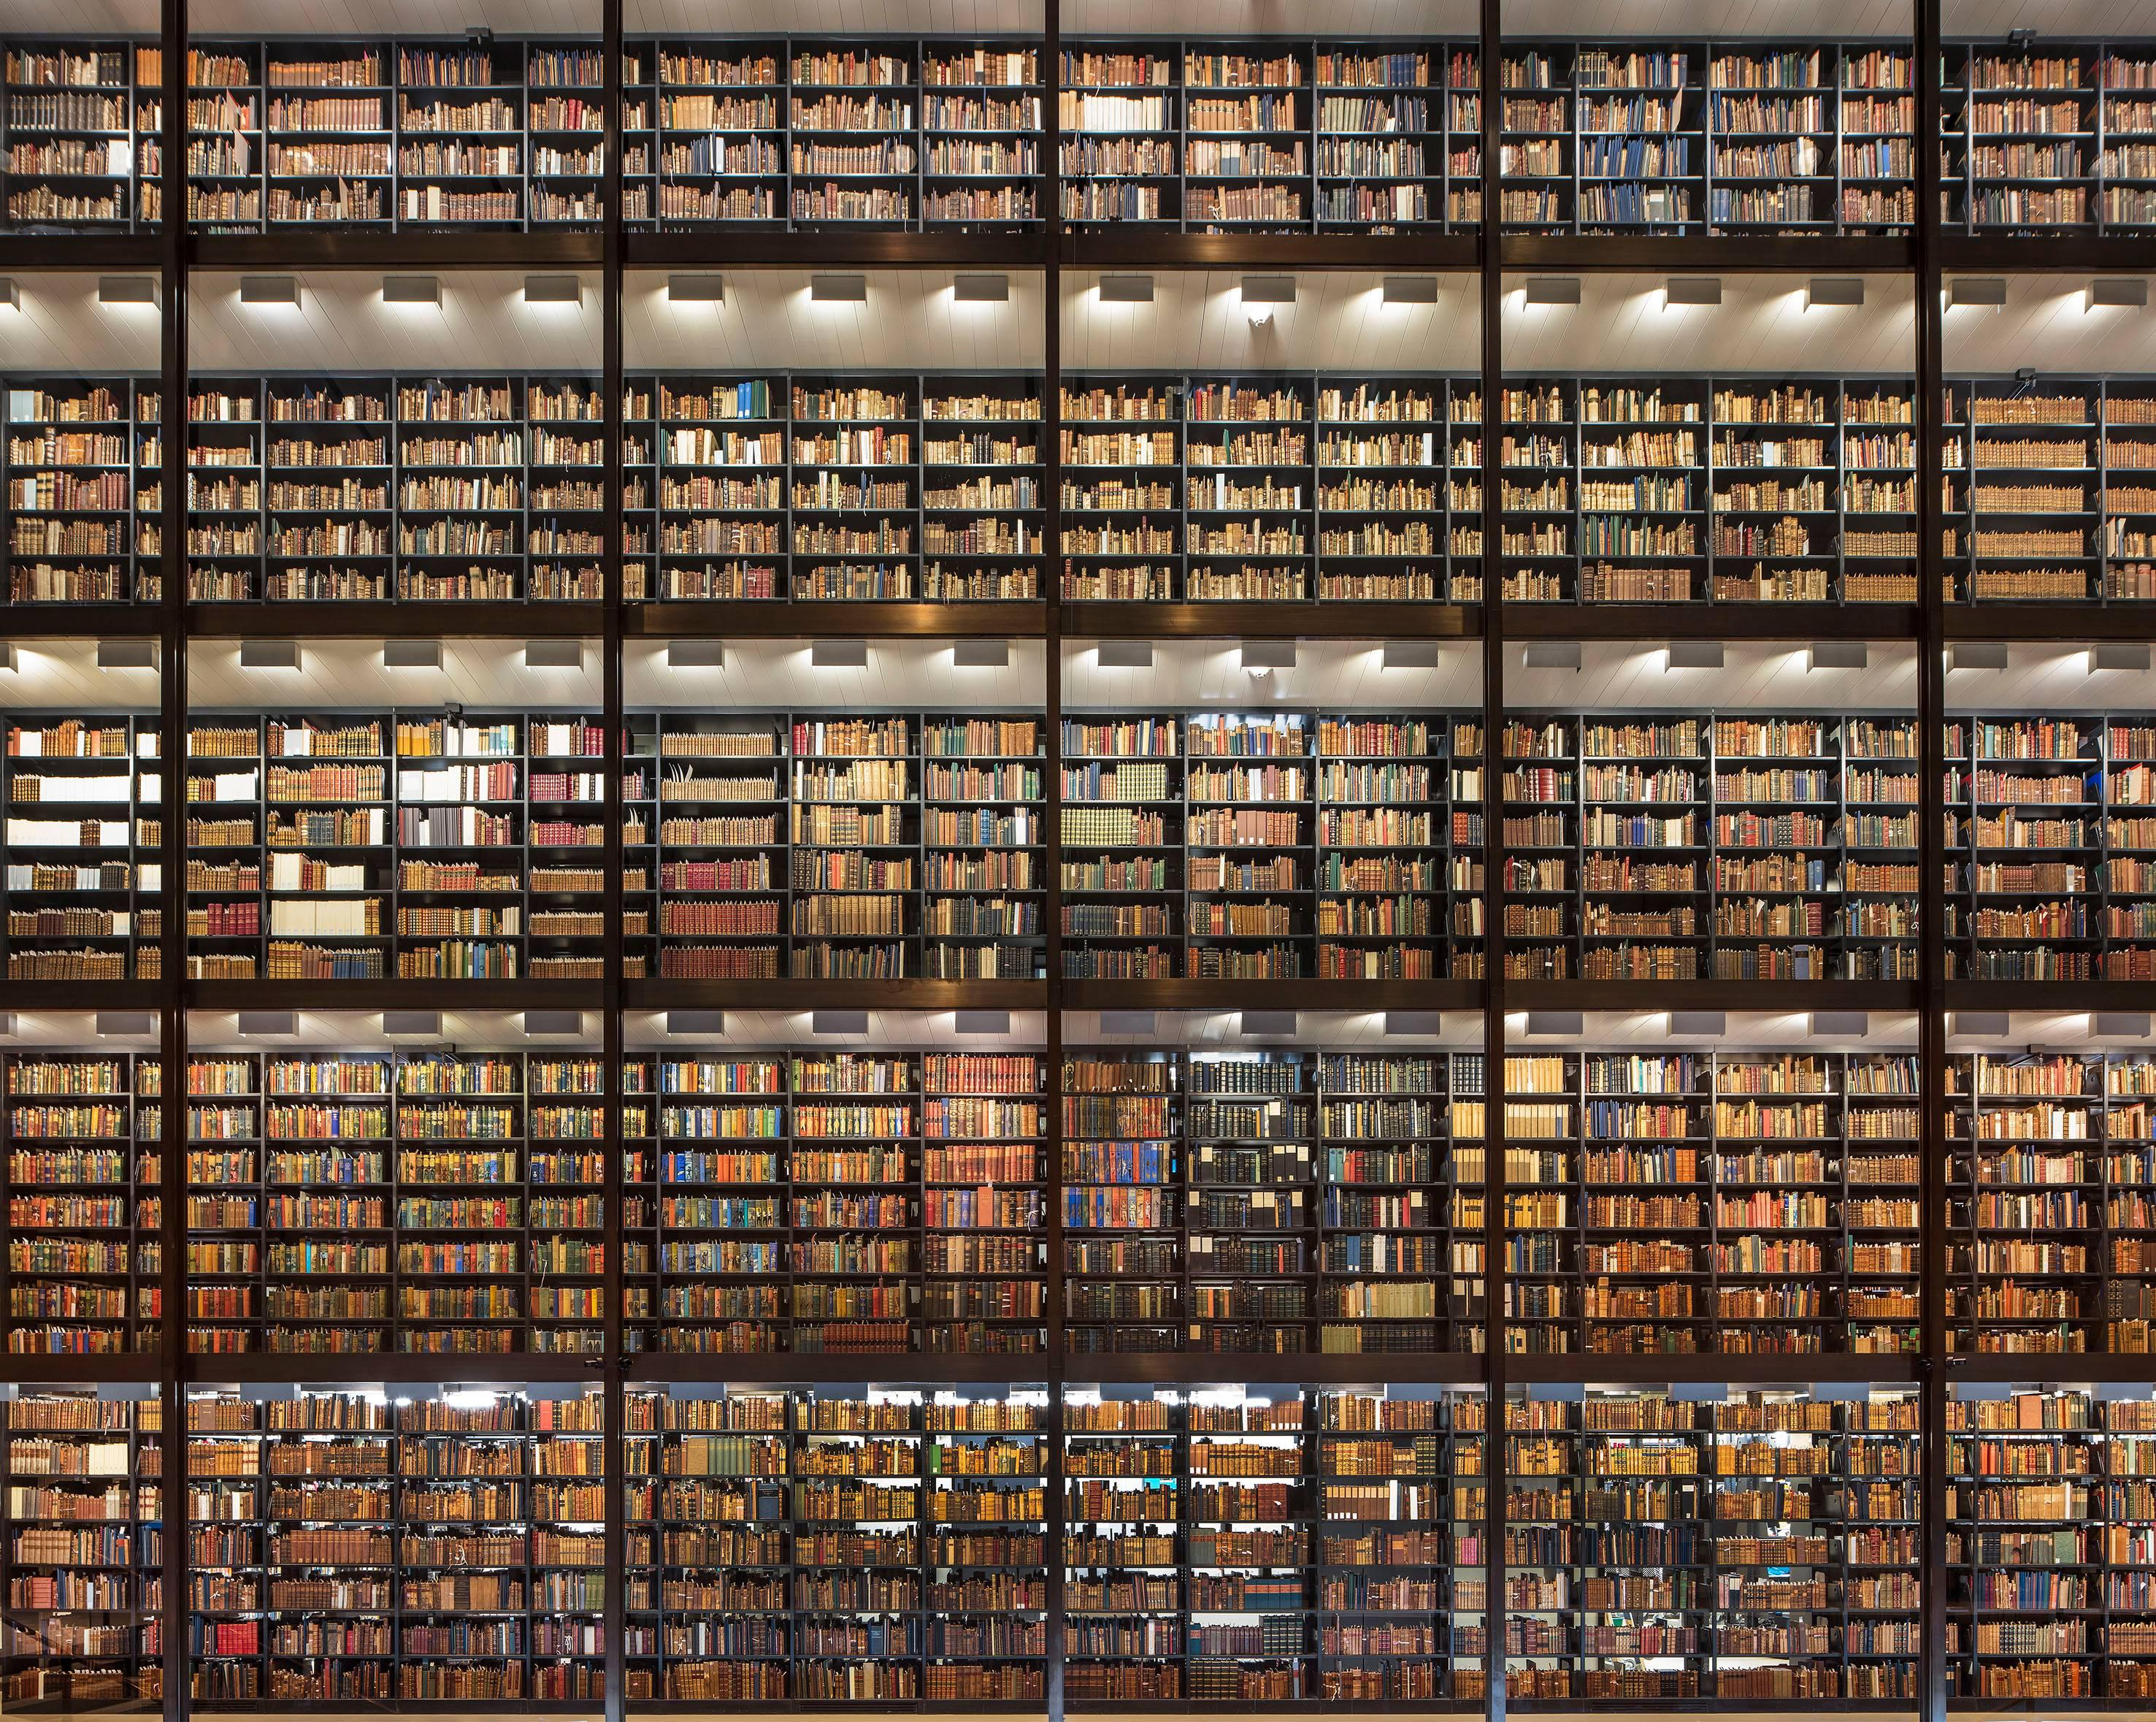 Reinhard Görner: Shining Wall of Books, Beinecke Rare Books & Manuscript Library